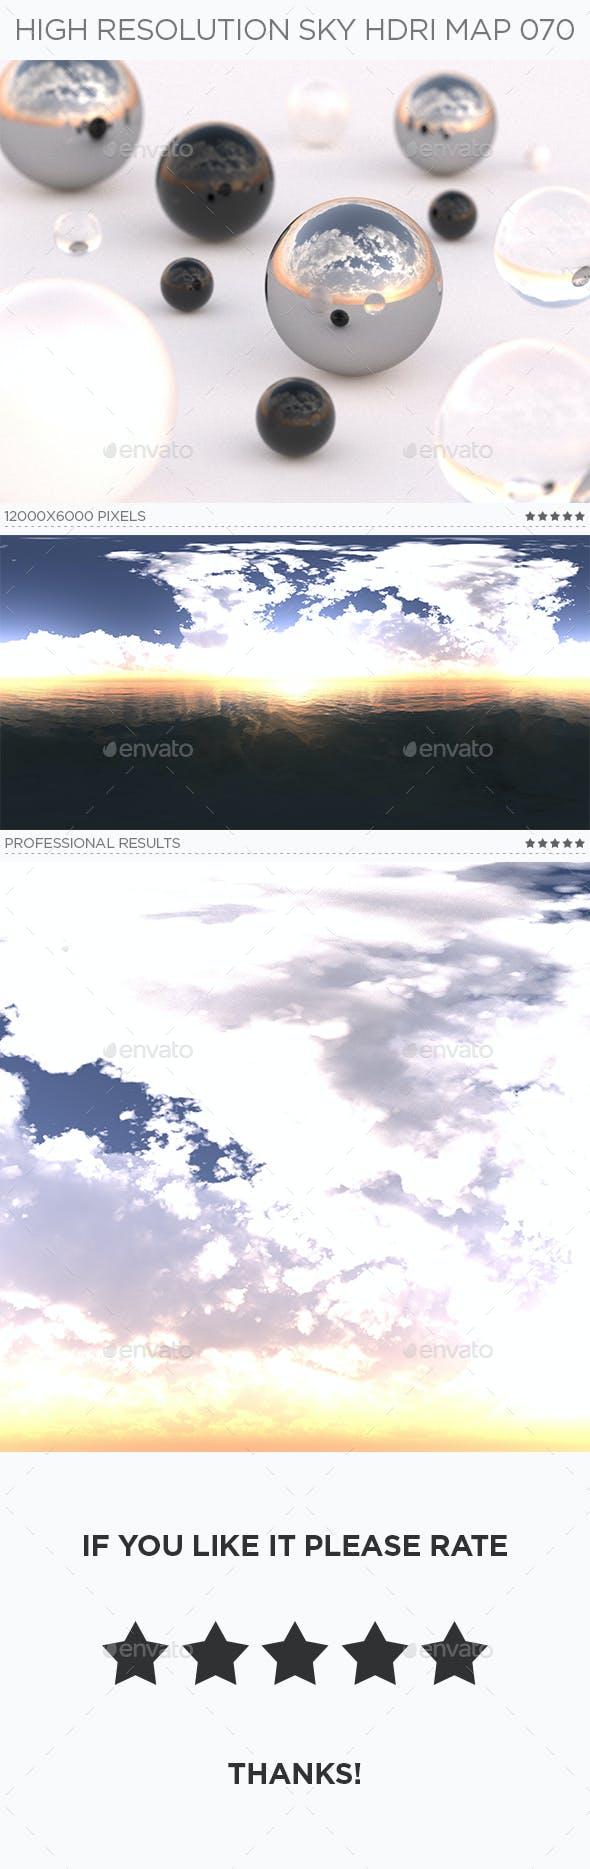 High Resolution Sky HDRi Map 070 - 3DOcean Item for Sale